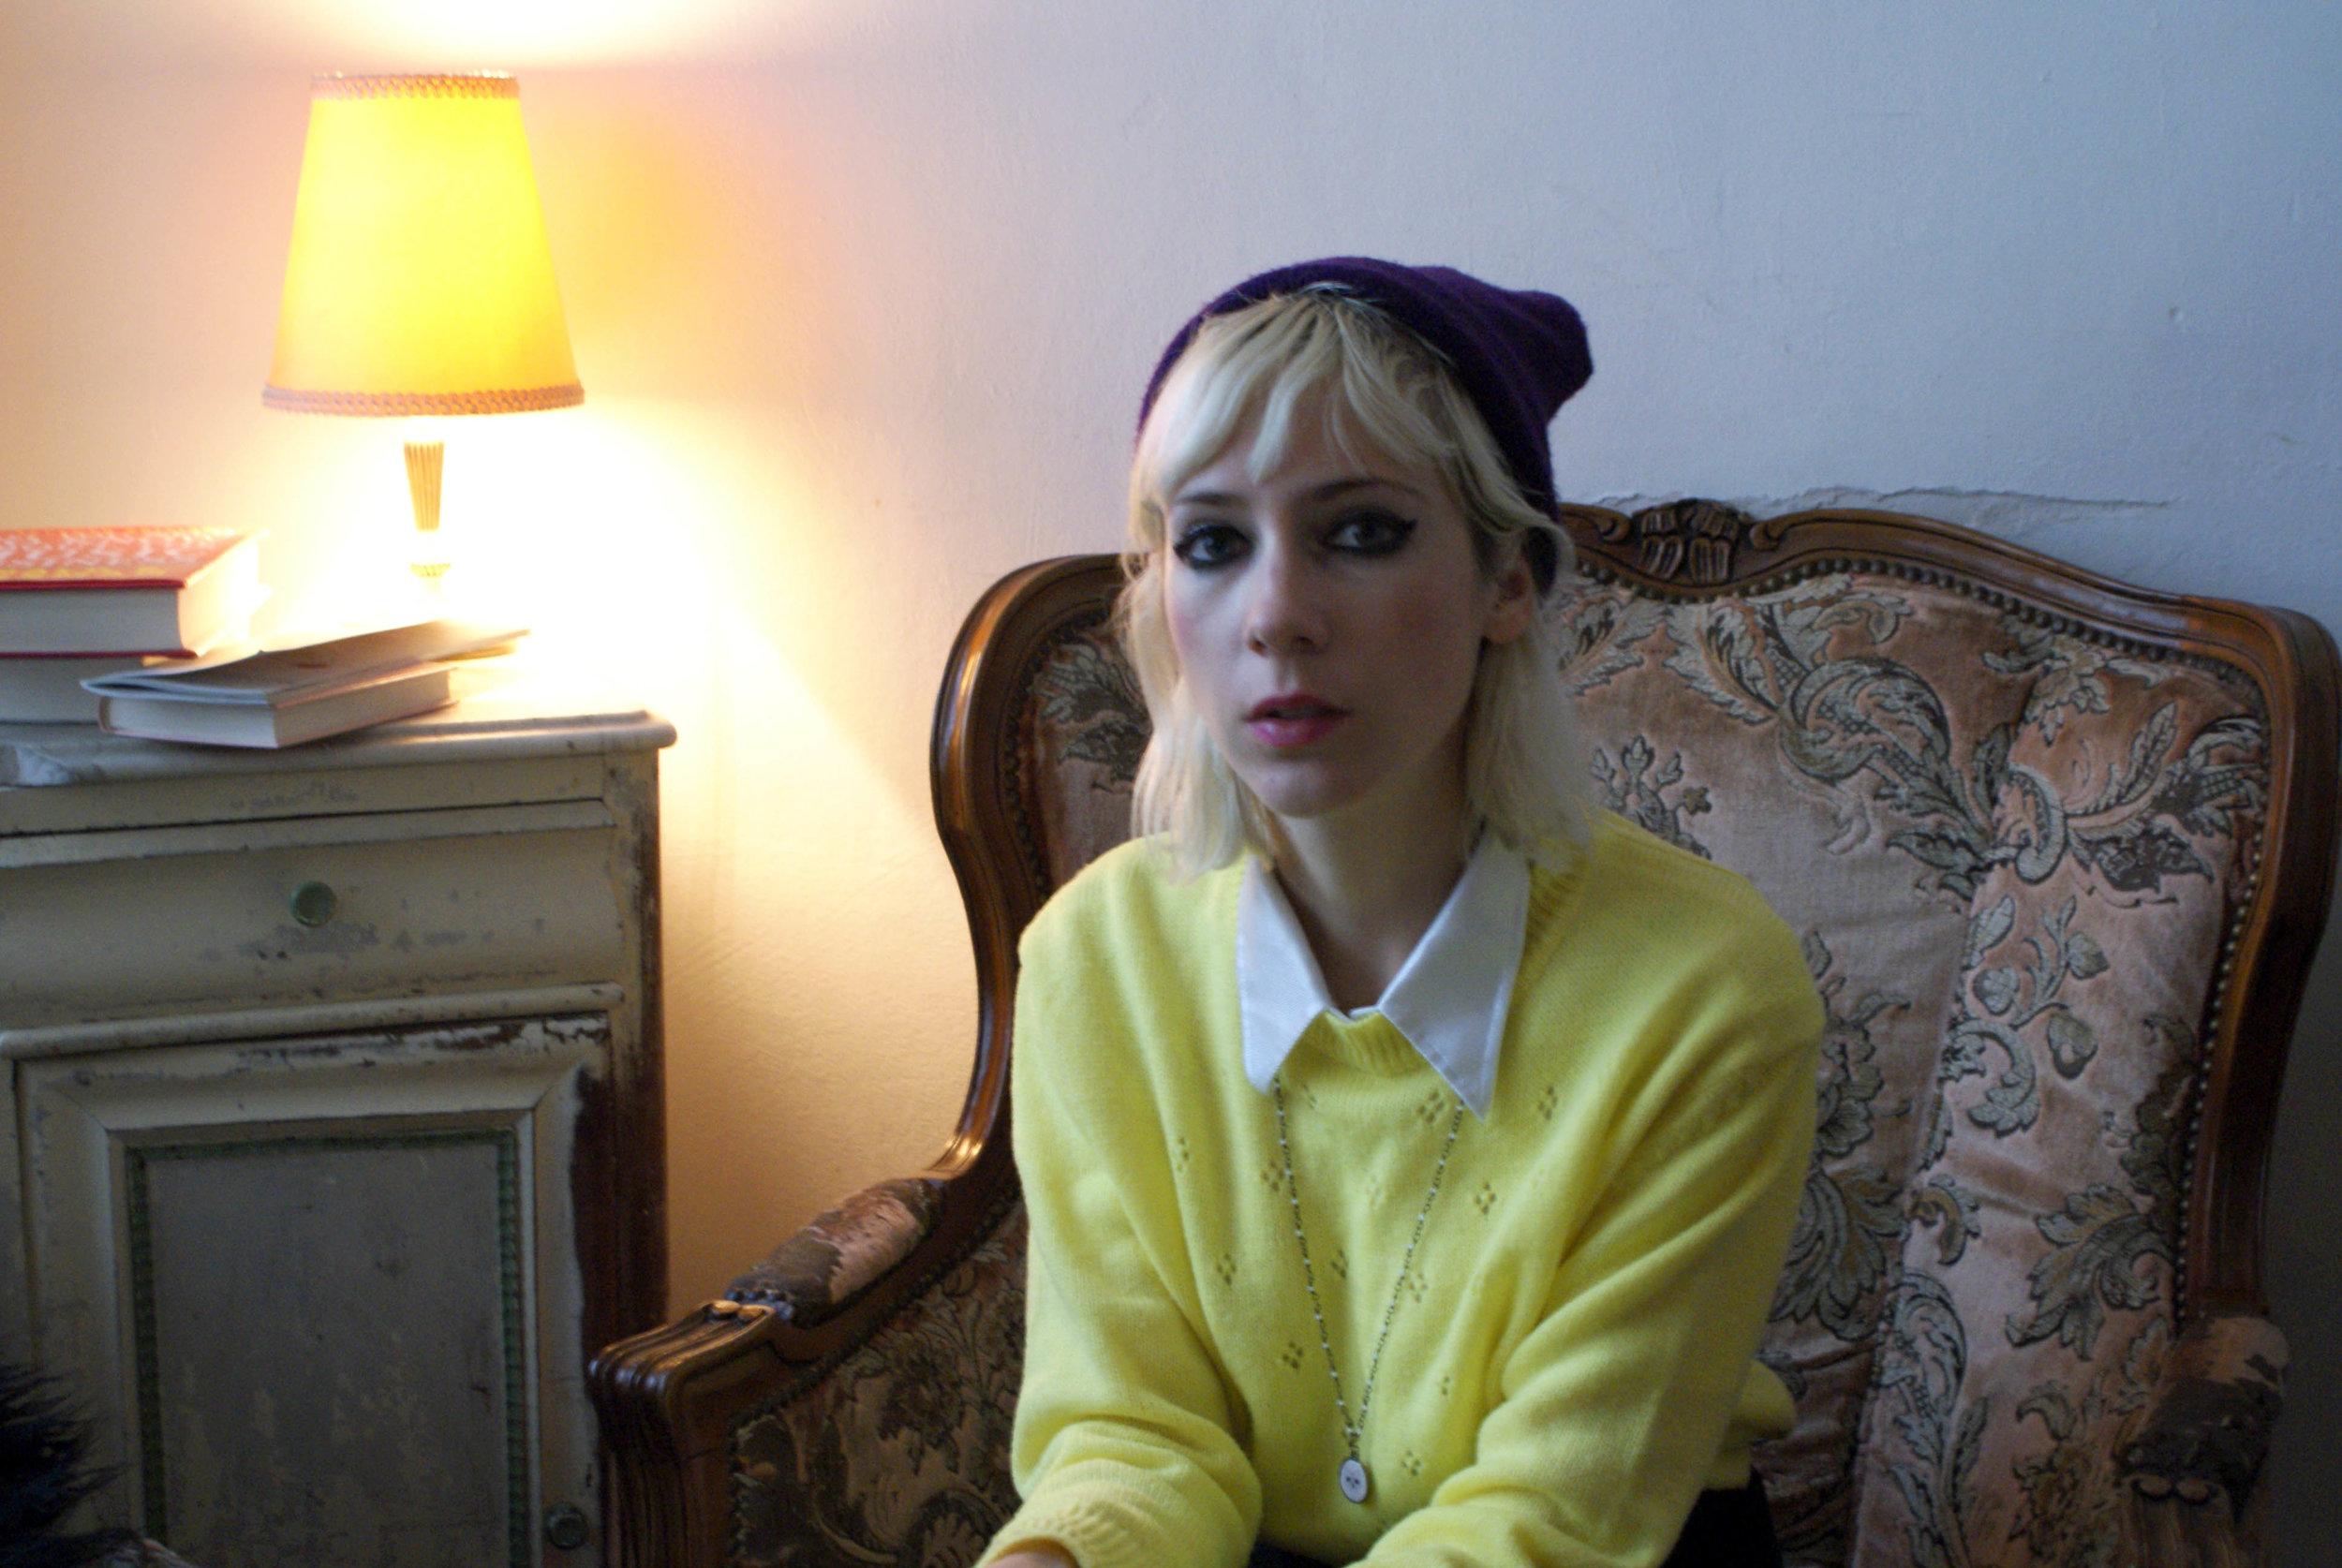 Laetitia Duveau by Sonia Alcaina Gallardo